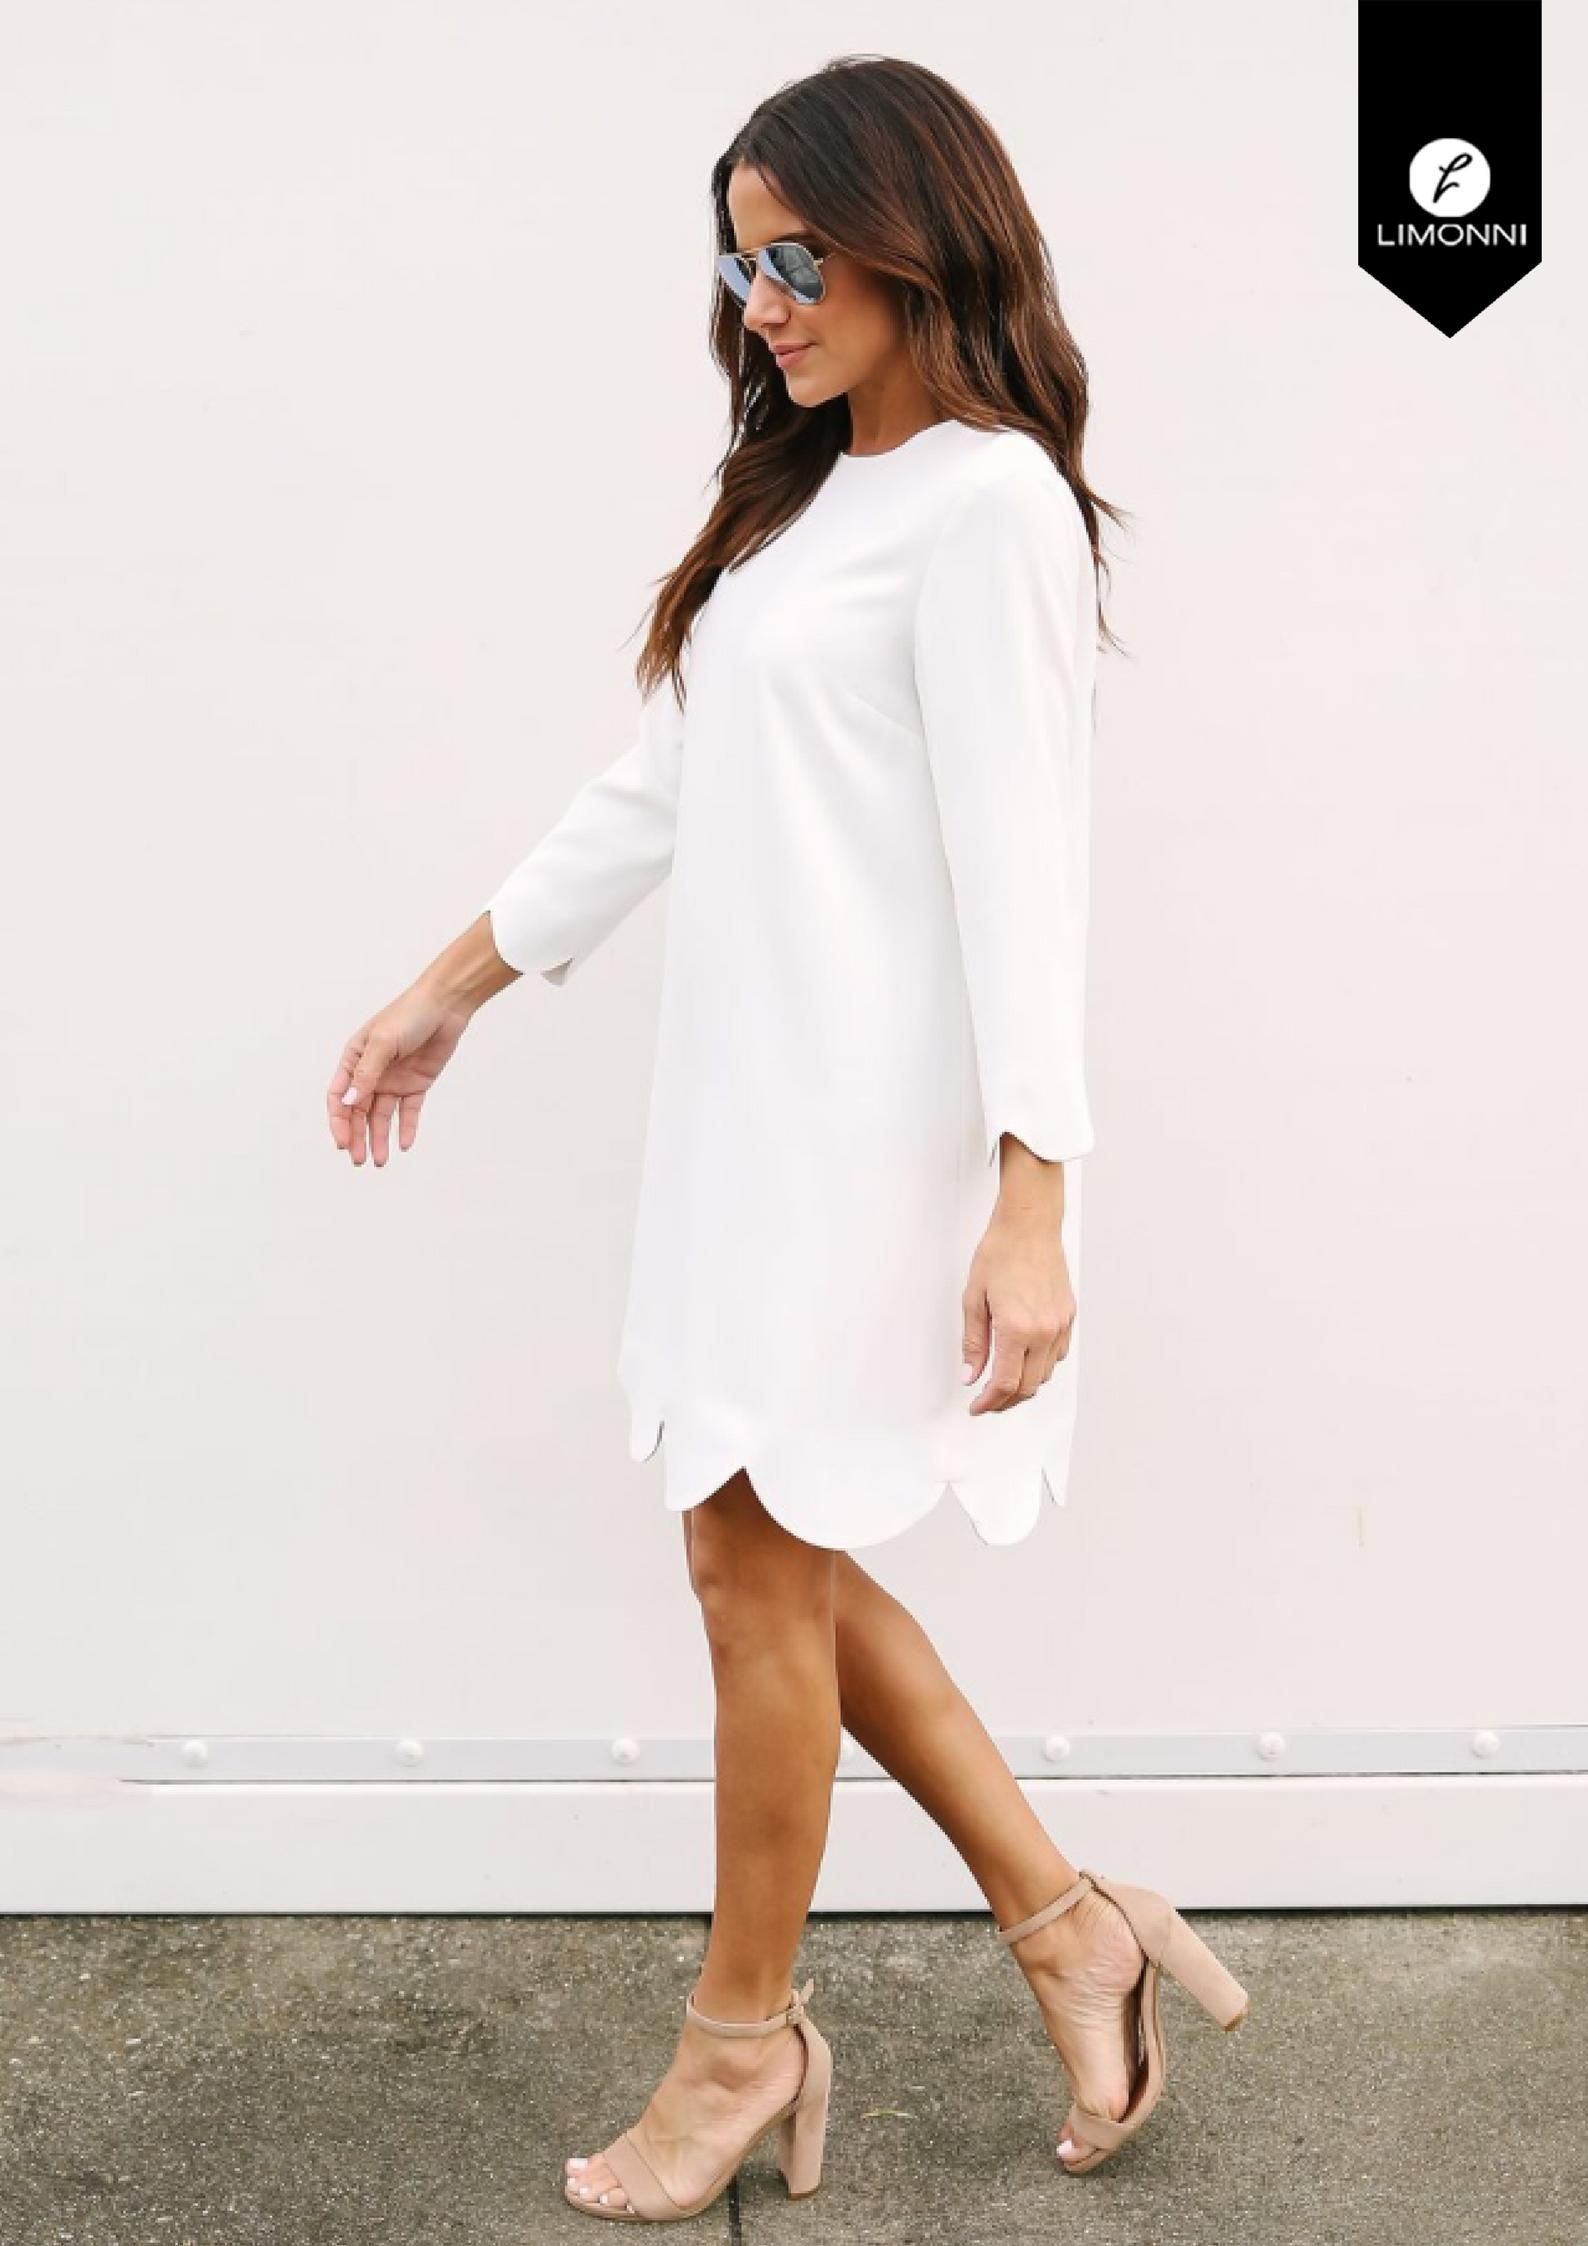 Vestidos para mujer Limonni Novalee LI1462 Cortos elegantes